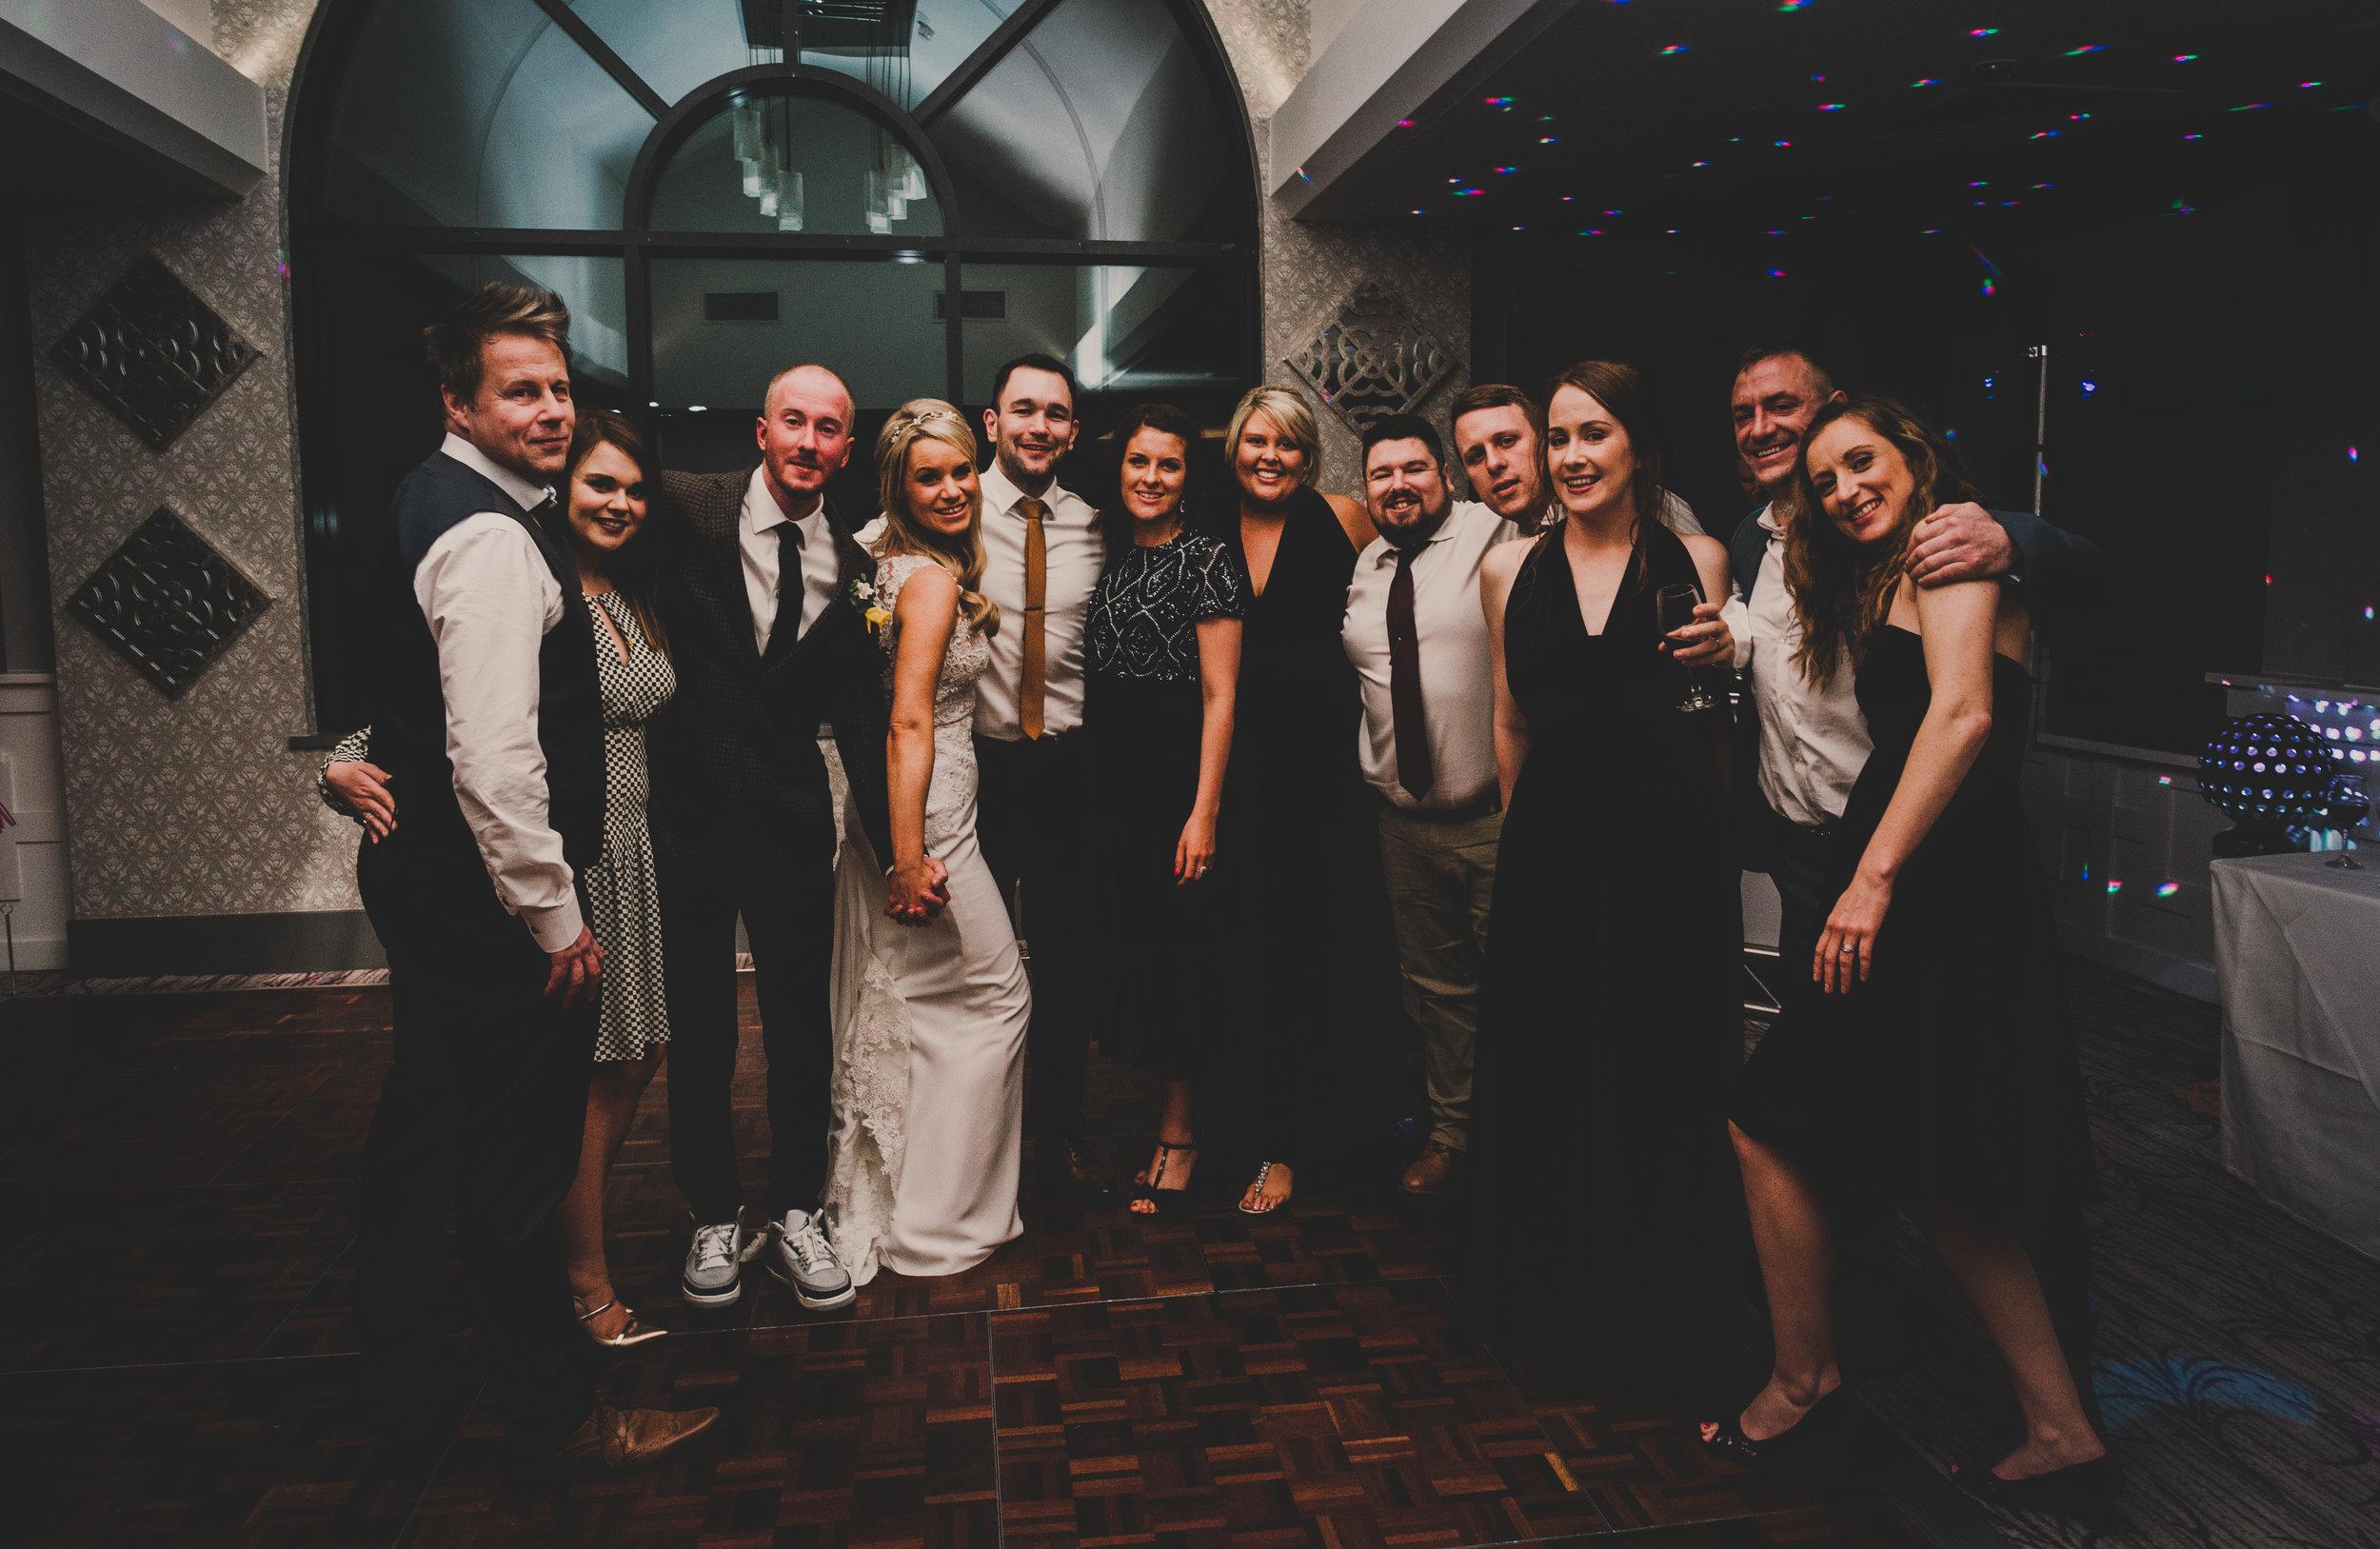 wales-wedding-photographer (66).jpg